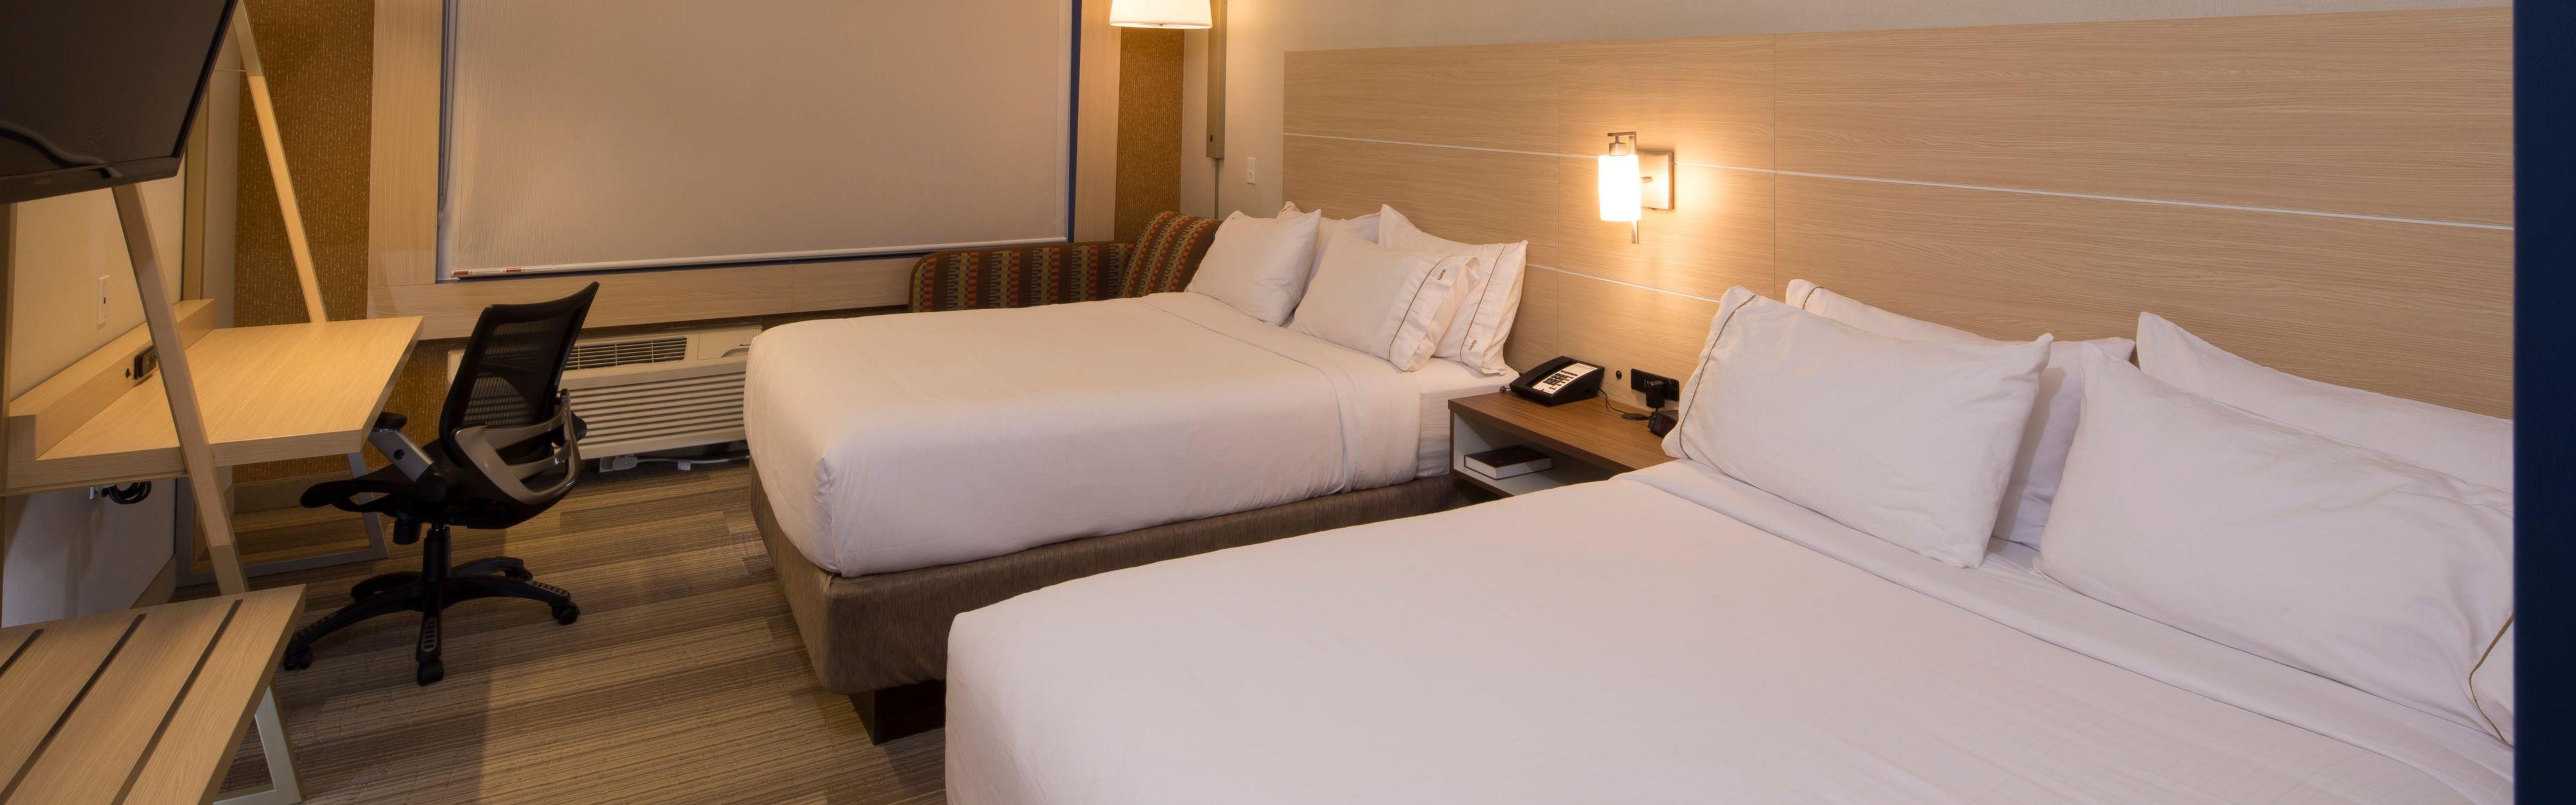 Holiday Inn Express Monroe image 1